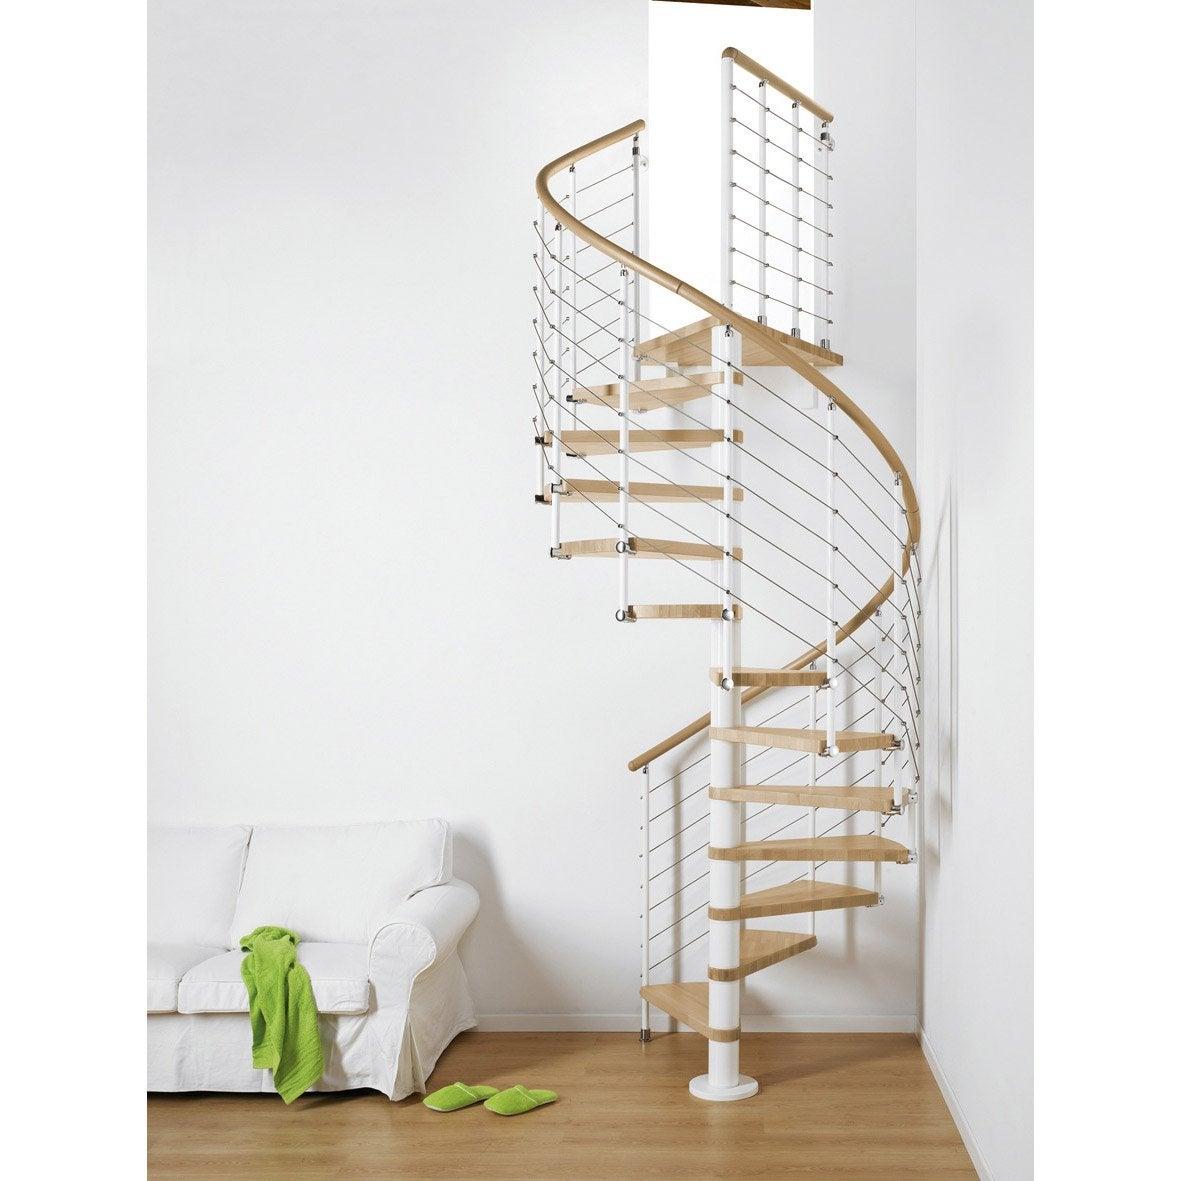 Escalier colima on rond ring structure m tal marche bois leroy merlin - Dimension escalier colimacon ...